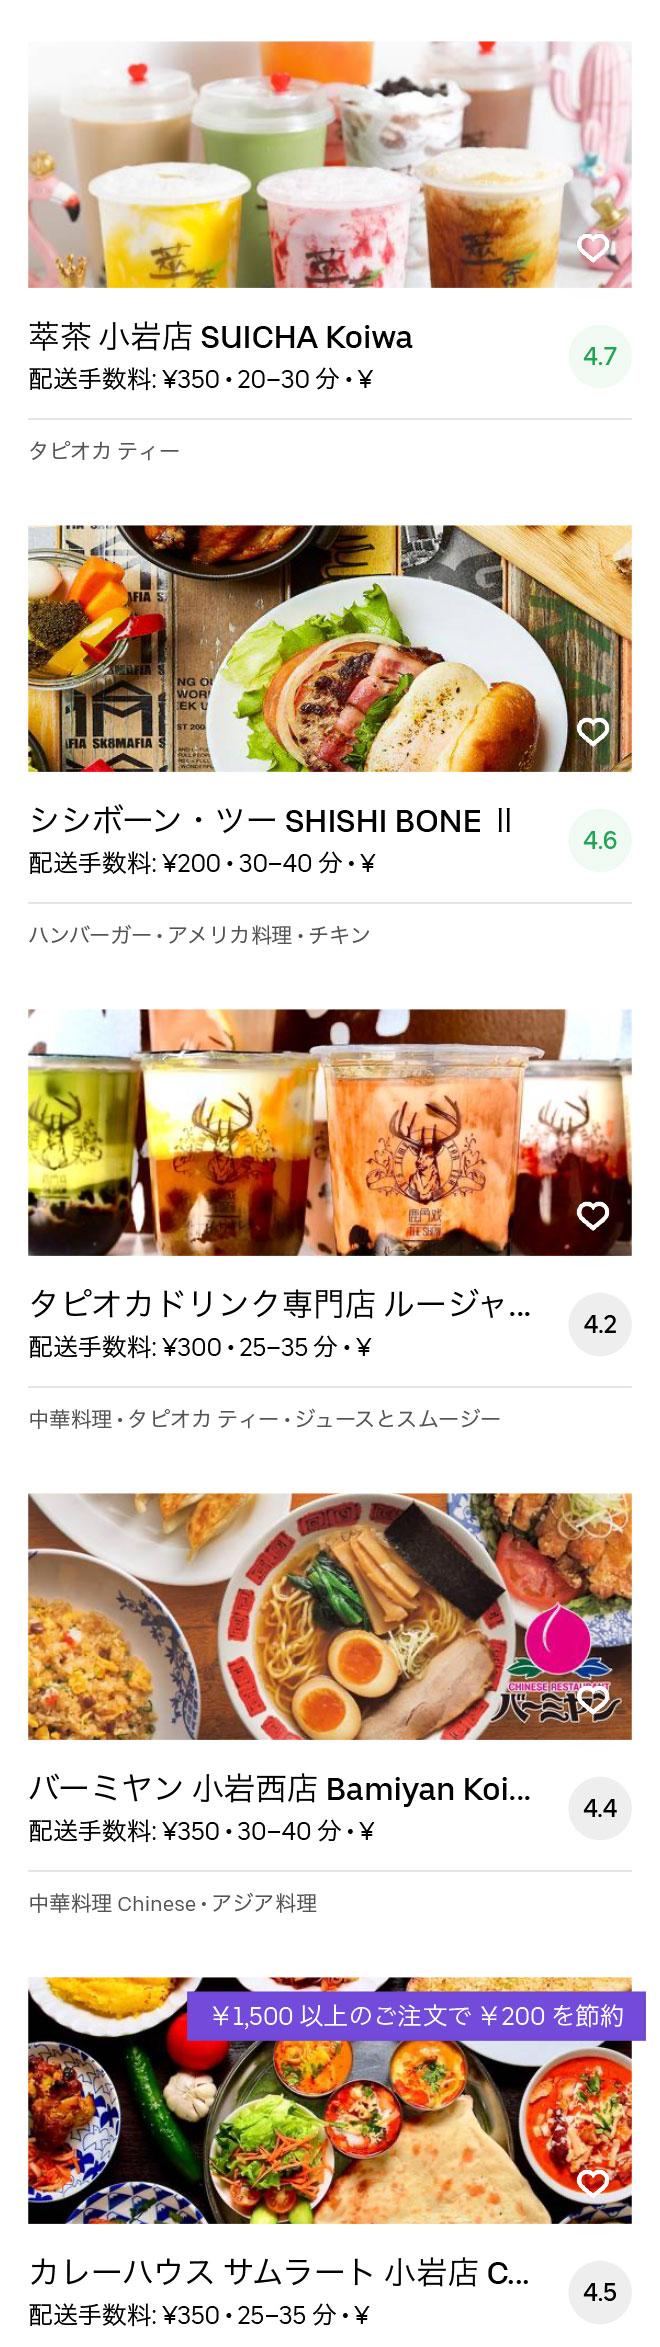 Ichikawa menu 2004 09